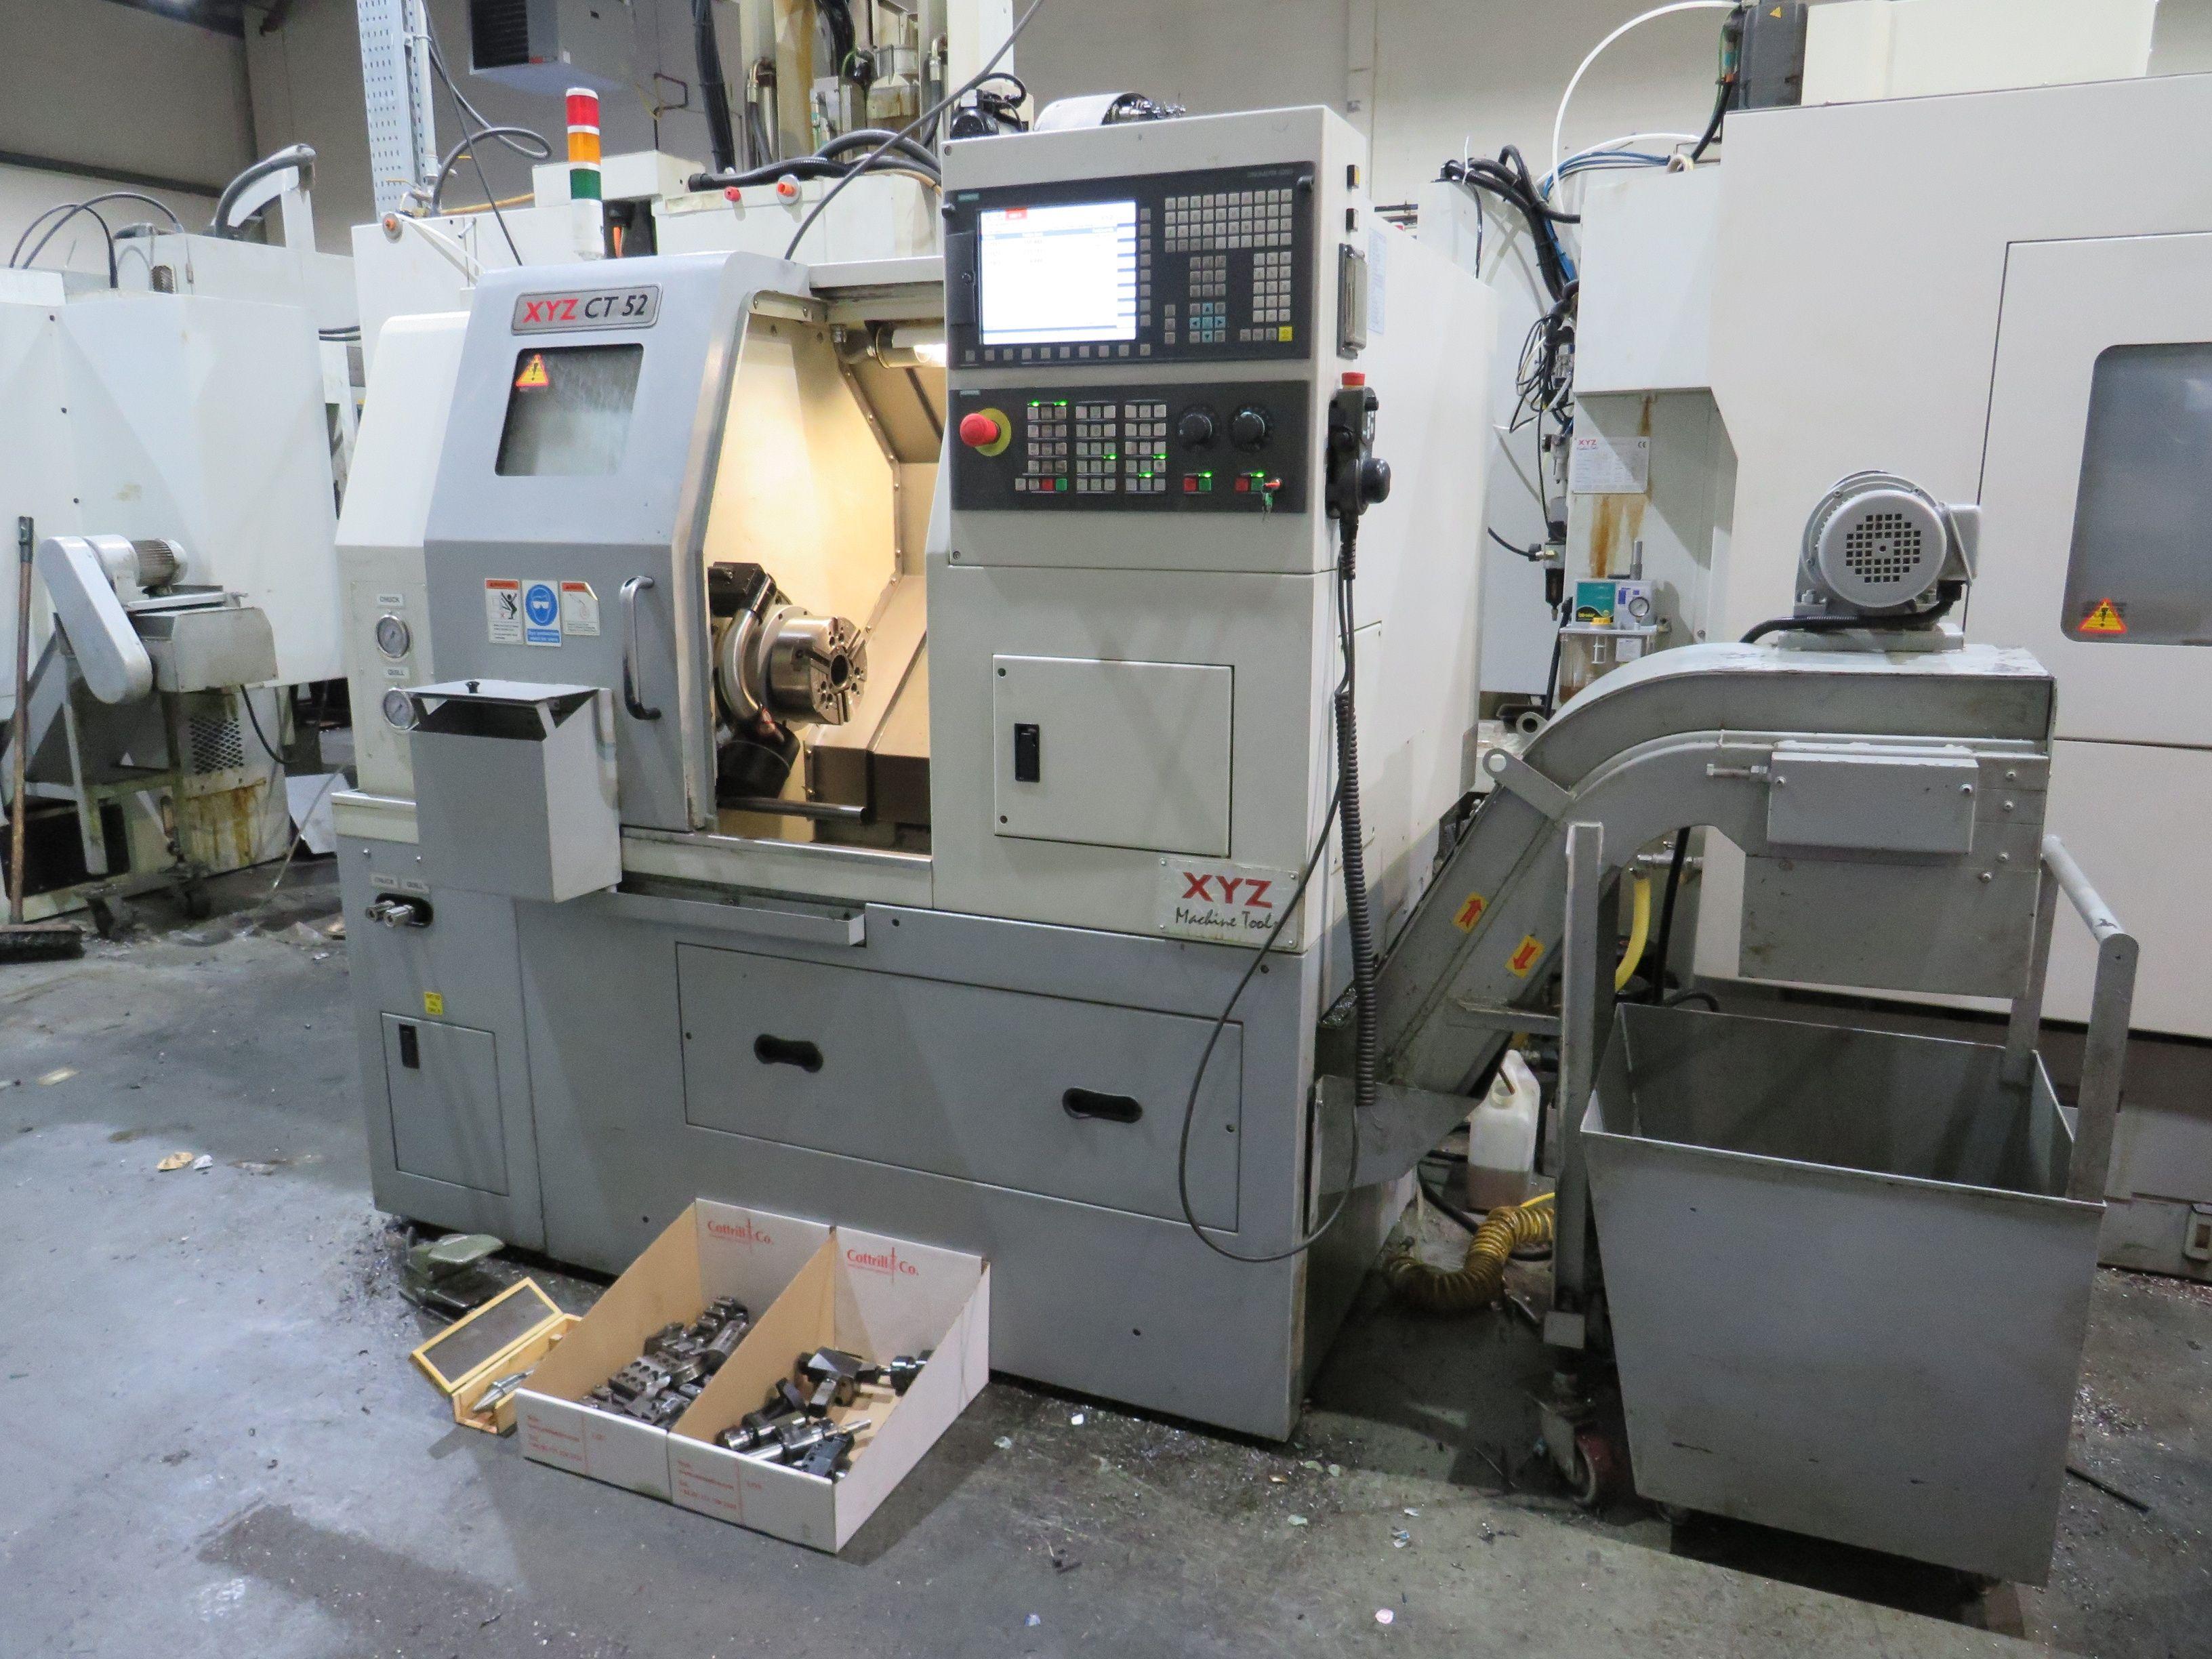 XYZ Compact Turn 52 Drehmaschine